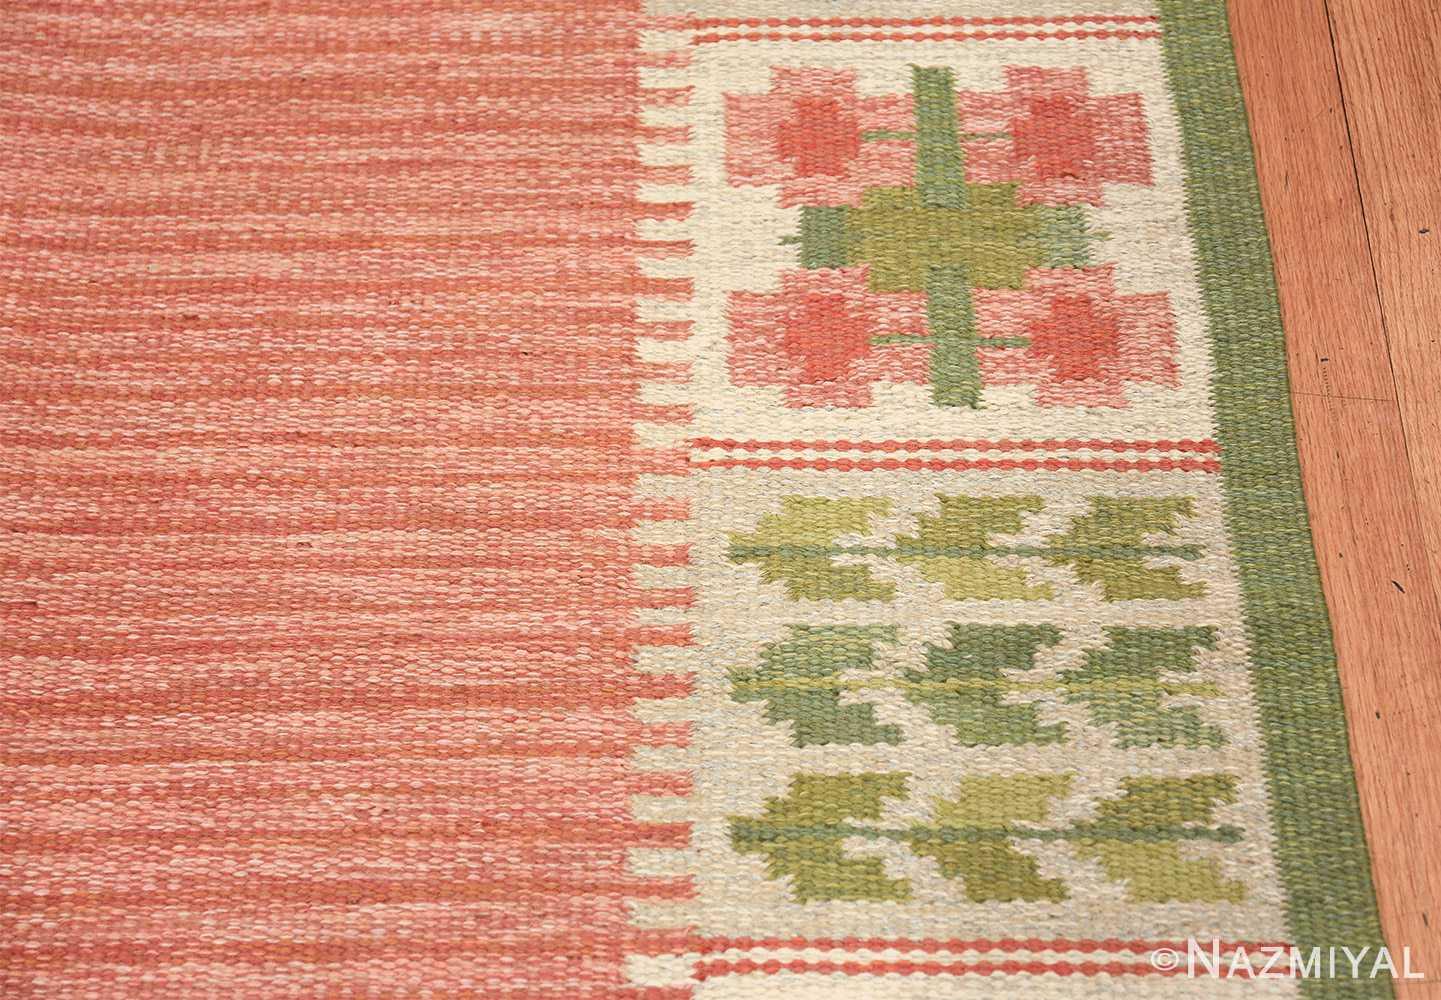 vintage scandinavian flat woven rug 46861 border Nazmiyal